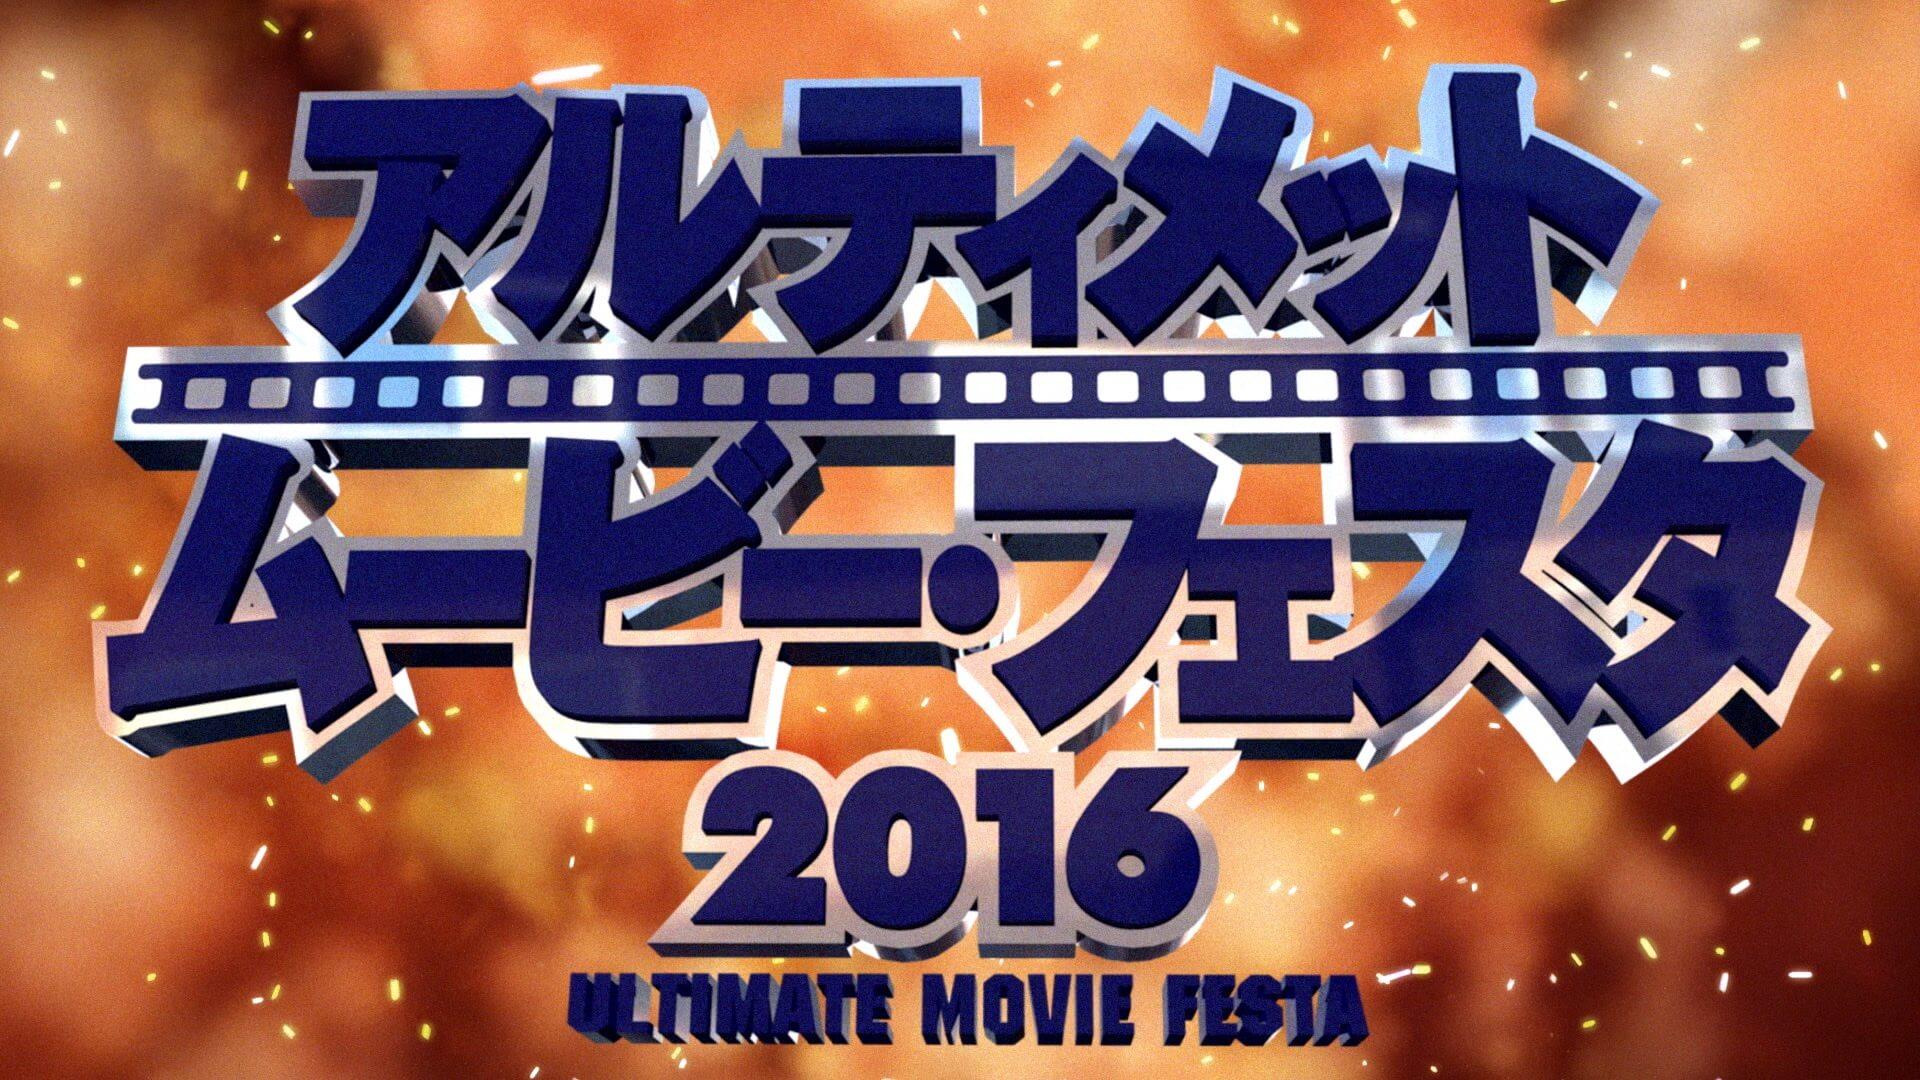 Ultimate Movie Fest 2016